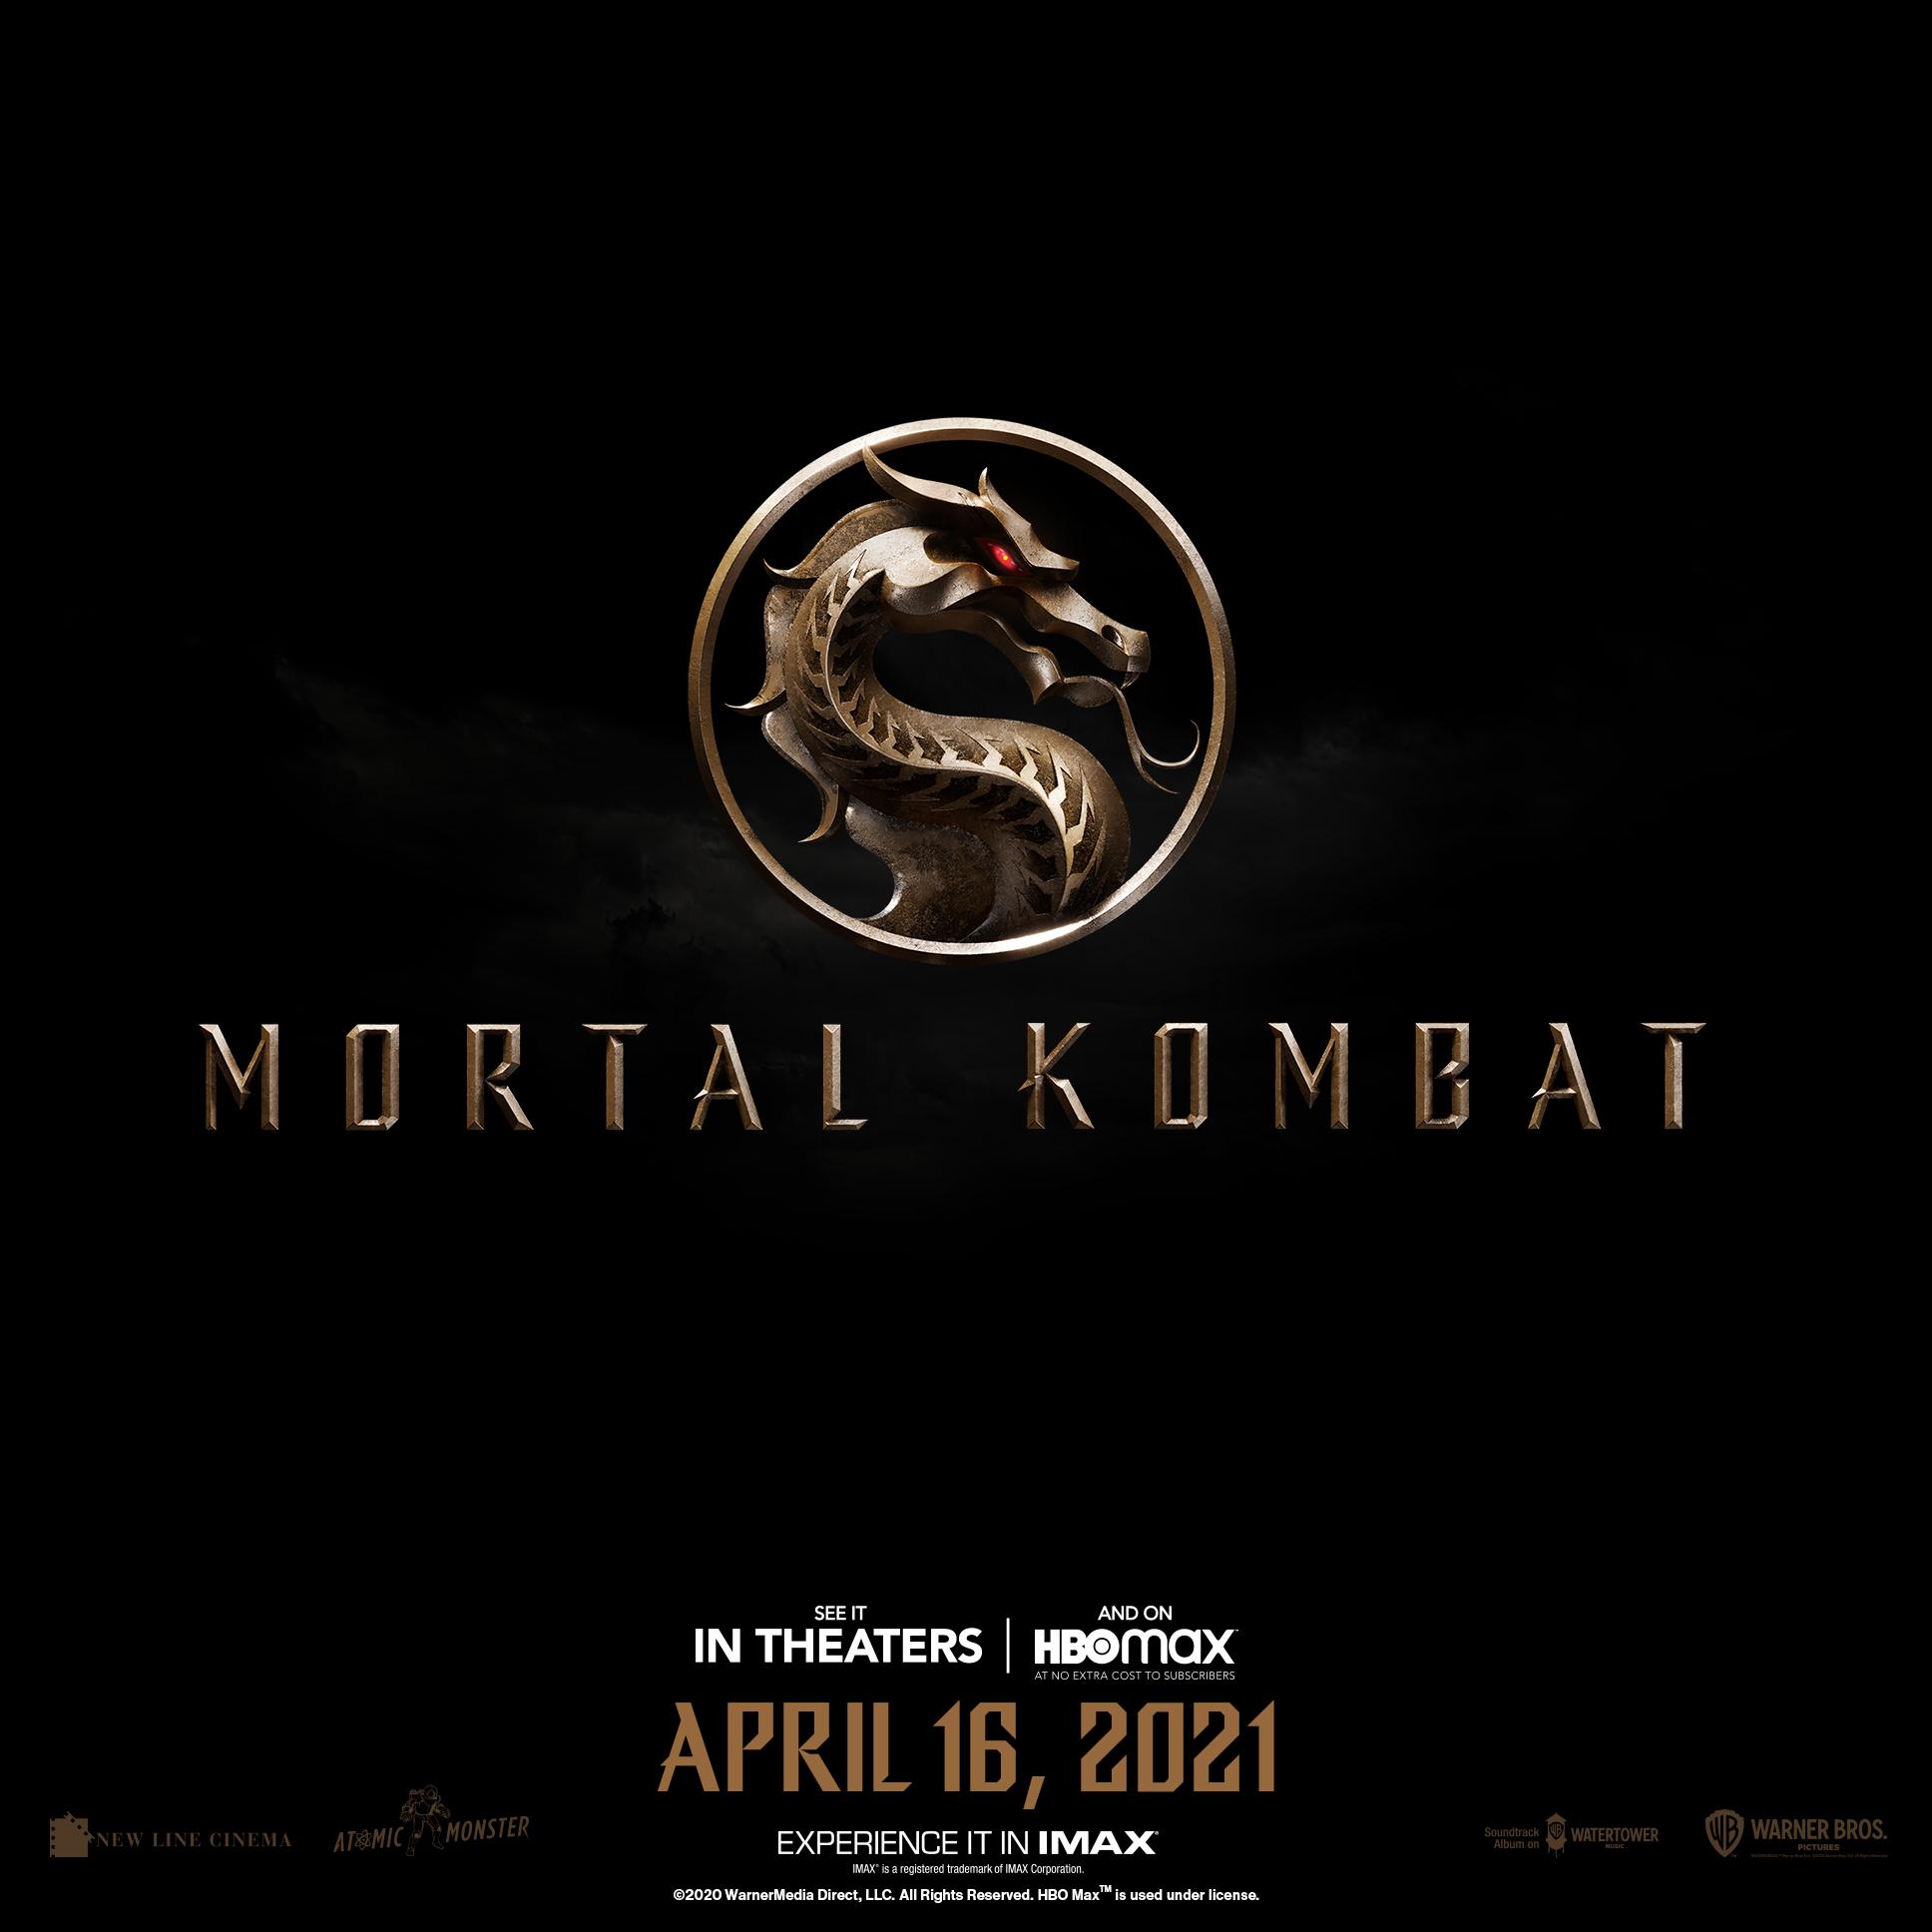 Sedm fotek z nového Mortal Kombat filmu MK